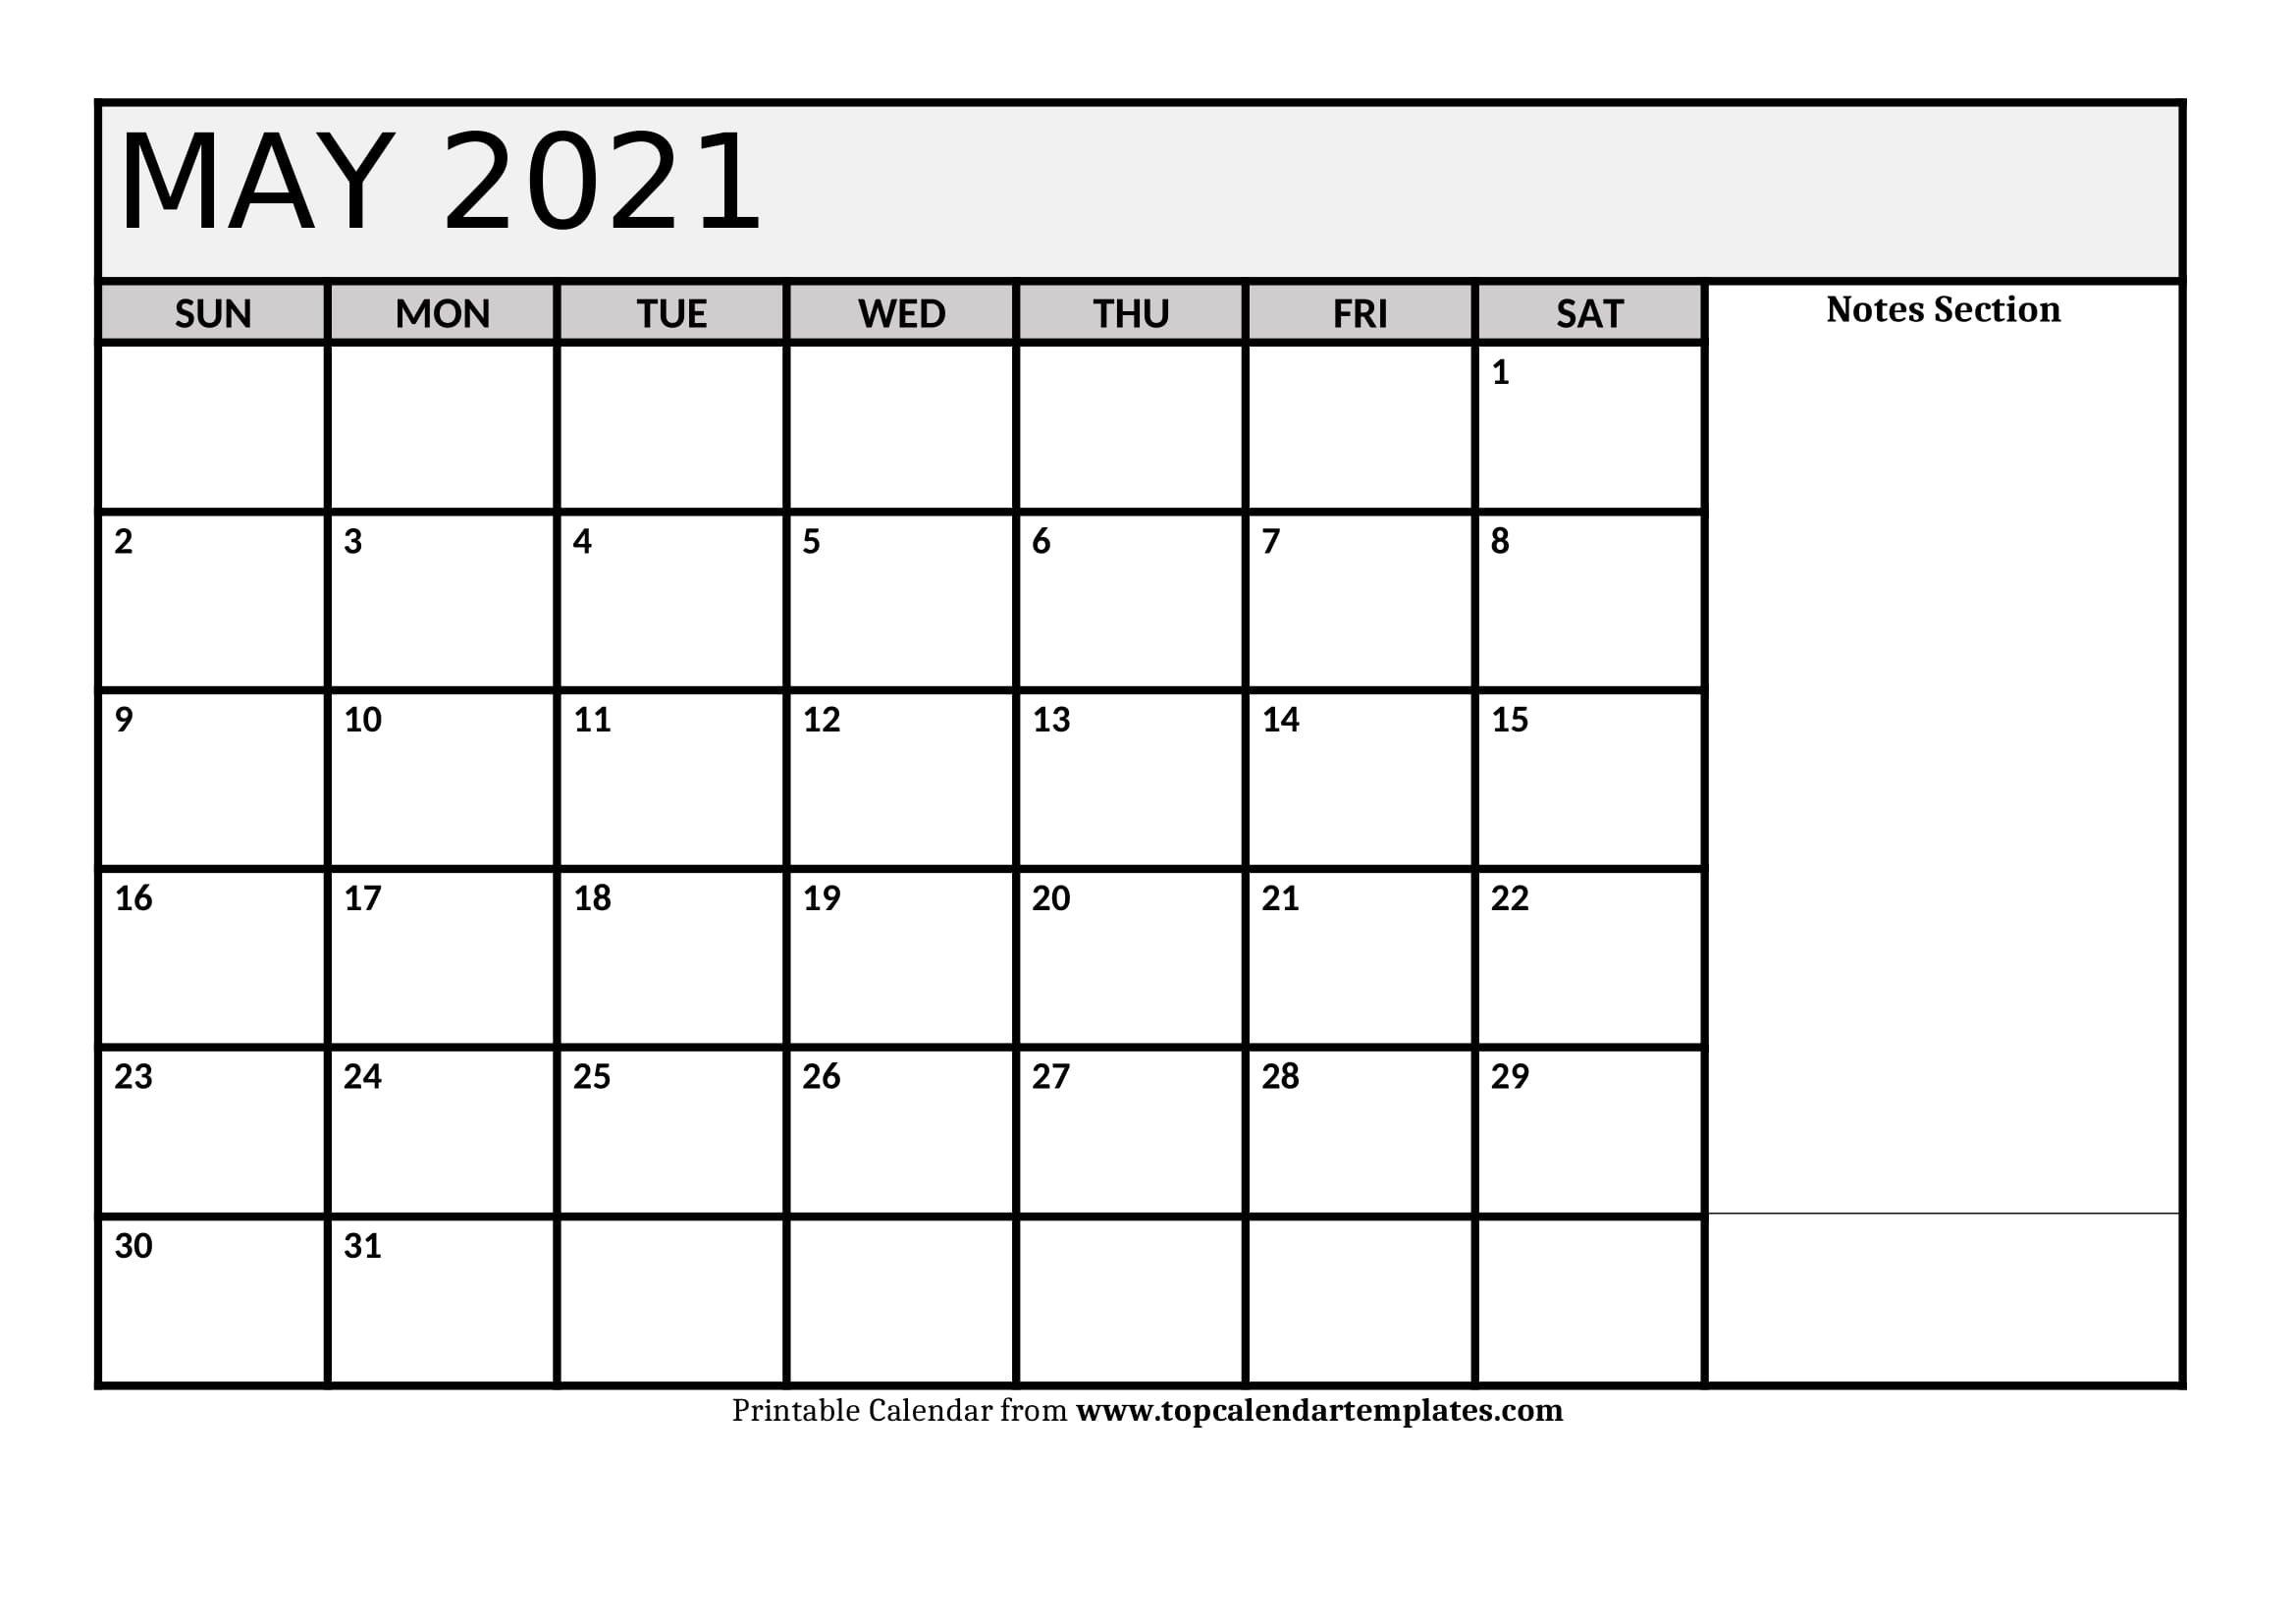 Free May 2021 Printable Calendar In Editable Format pertaining to 2021 Free Printable Weekly Calendar Blank